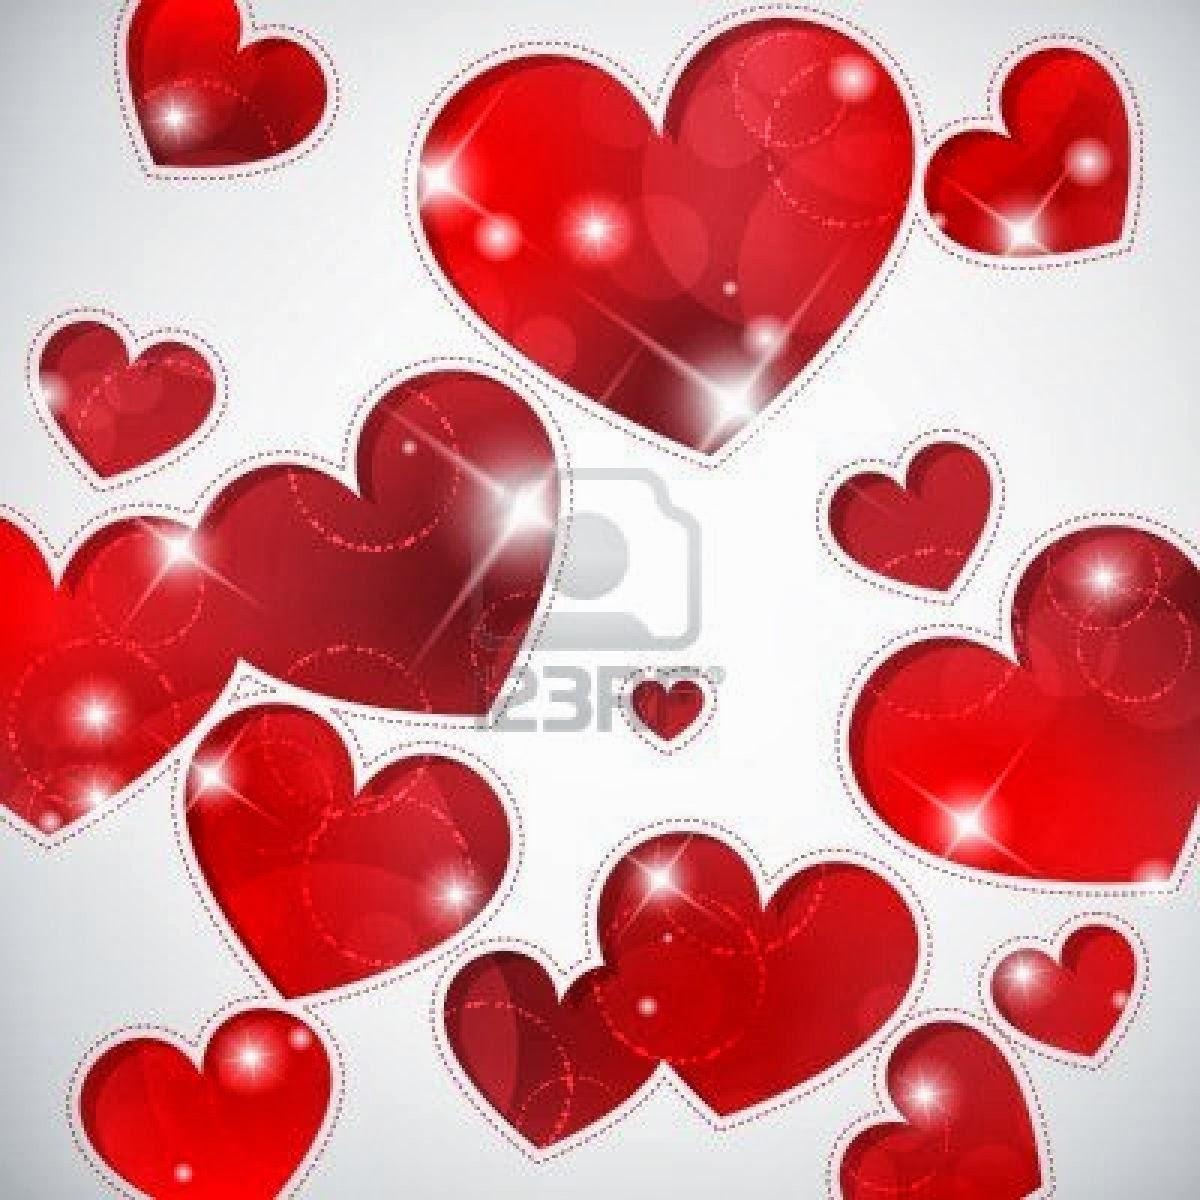 Imagenes De Amor Para Mandar Por Whatsapp Imagenes De Amor Bonitas